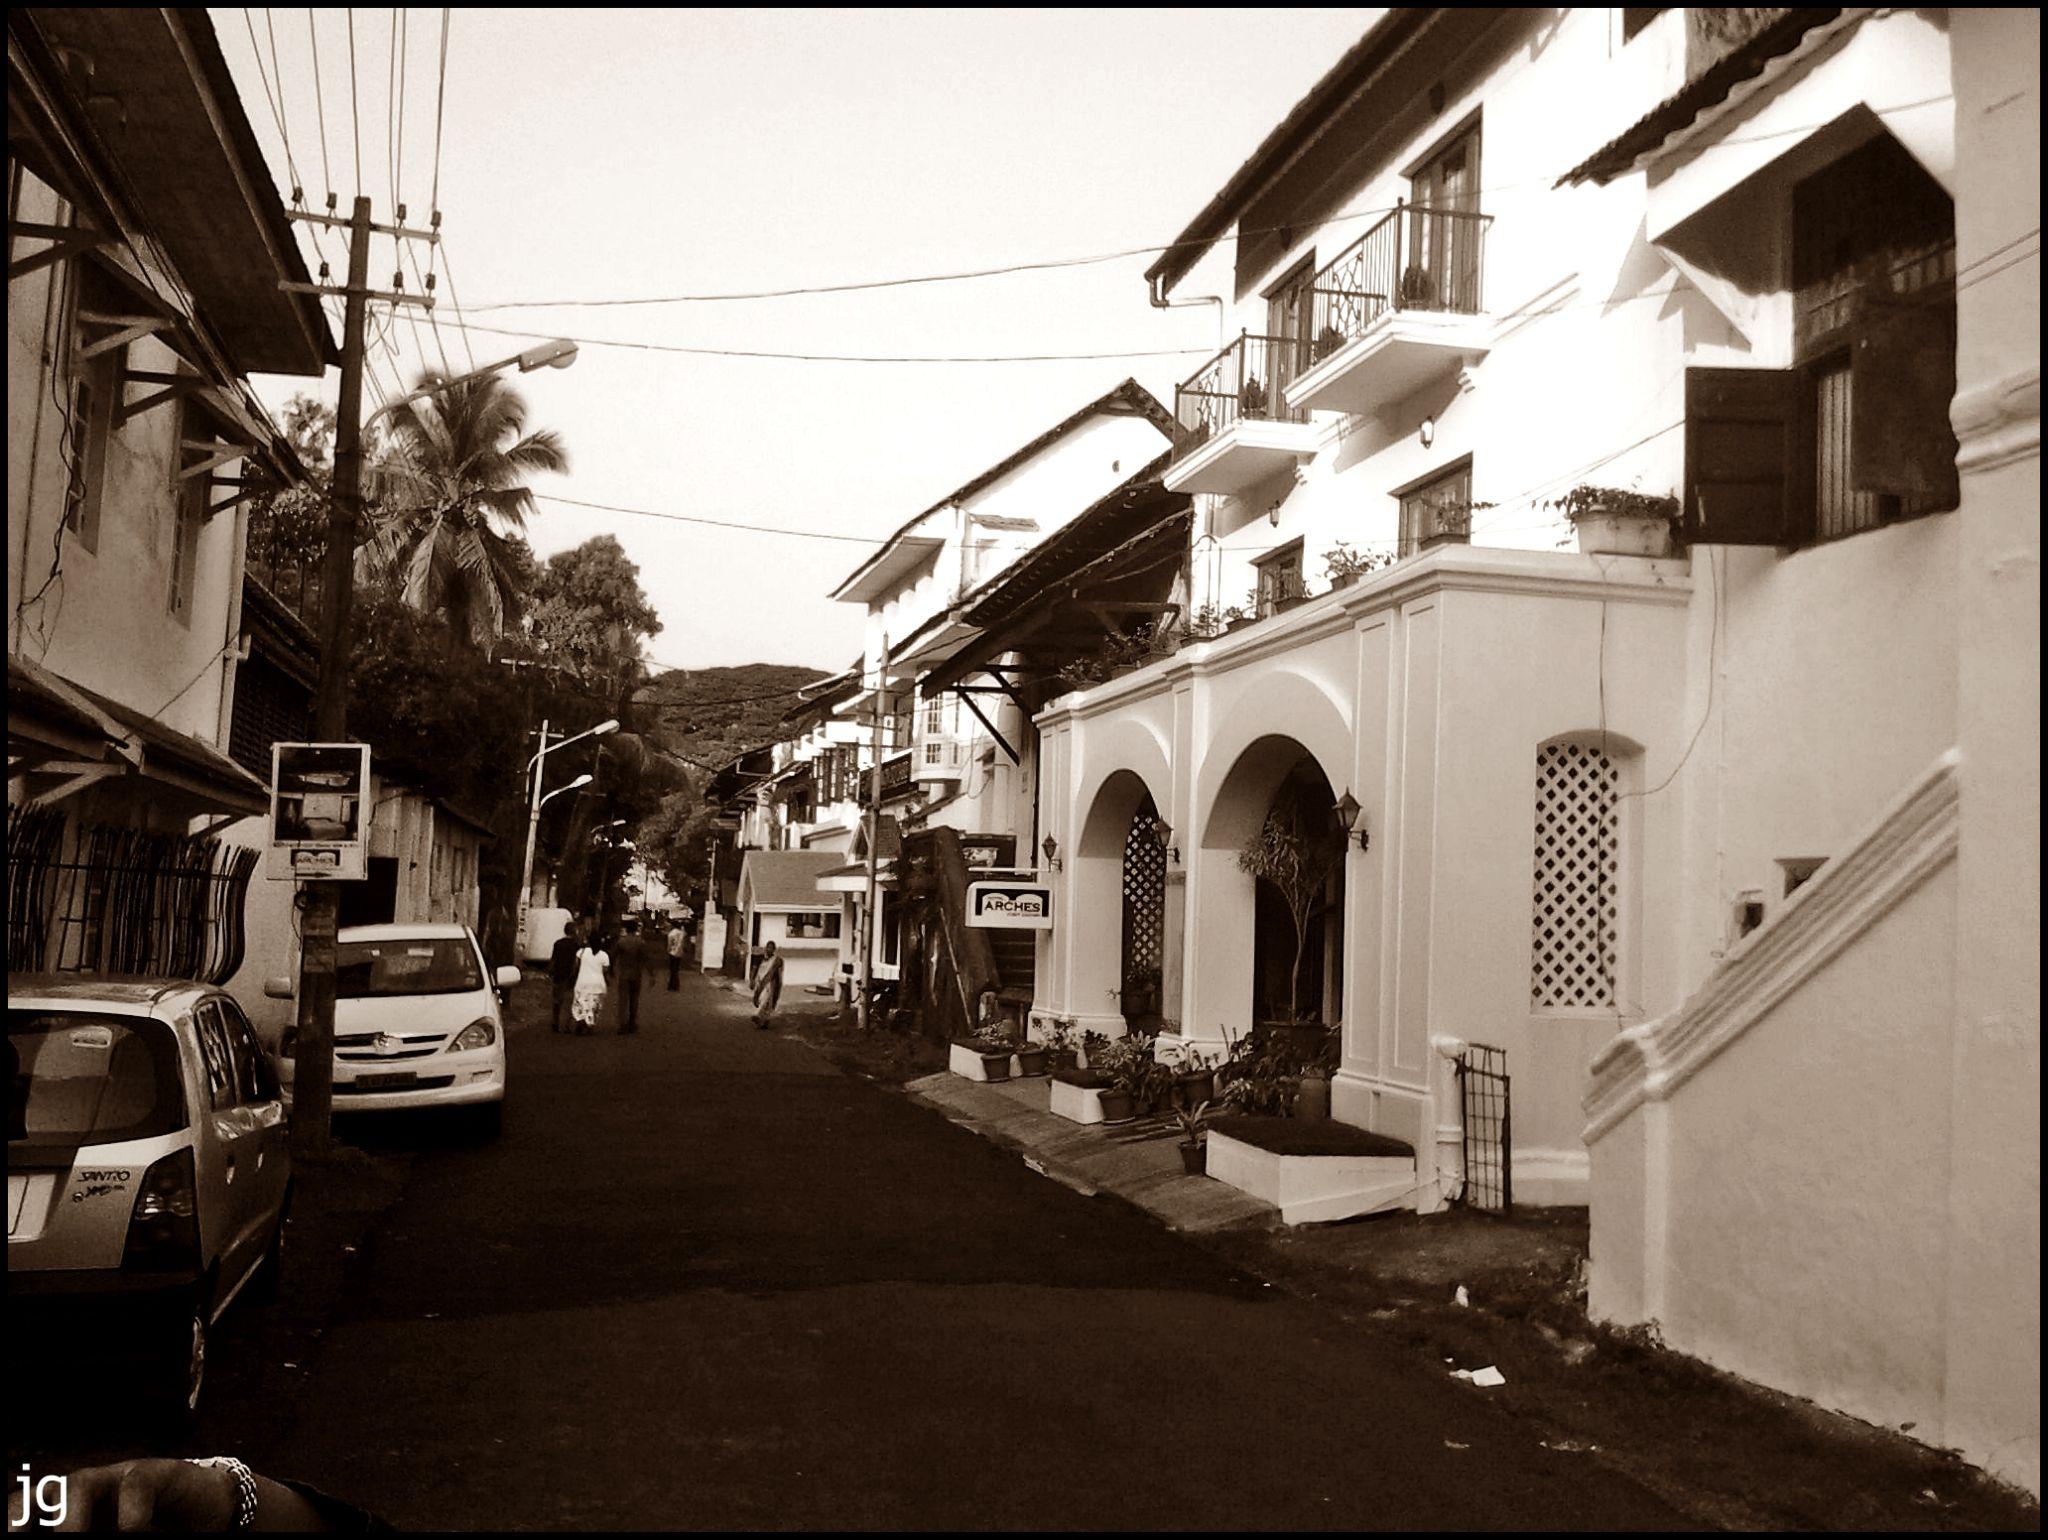 Cochin,Kerala,India by Jg Mobile Photography